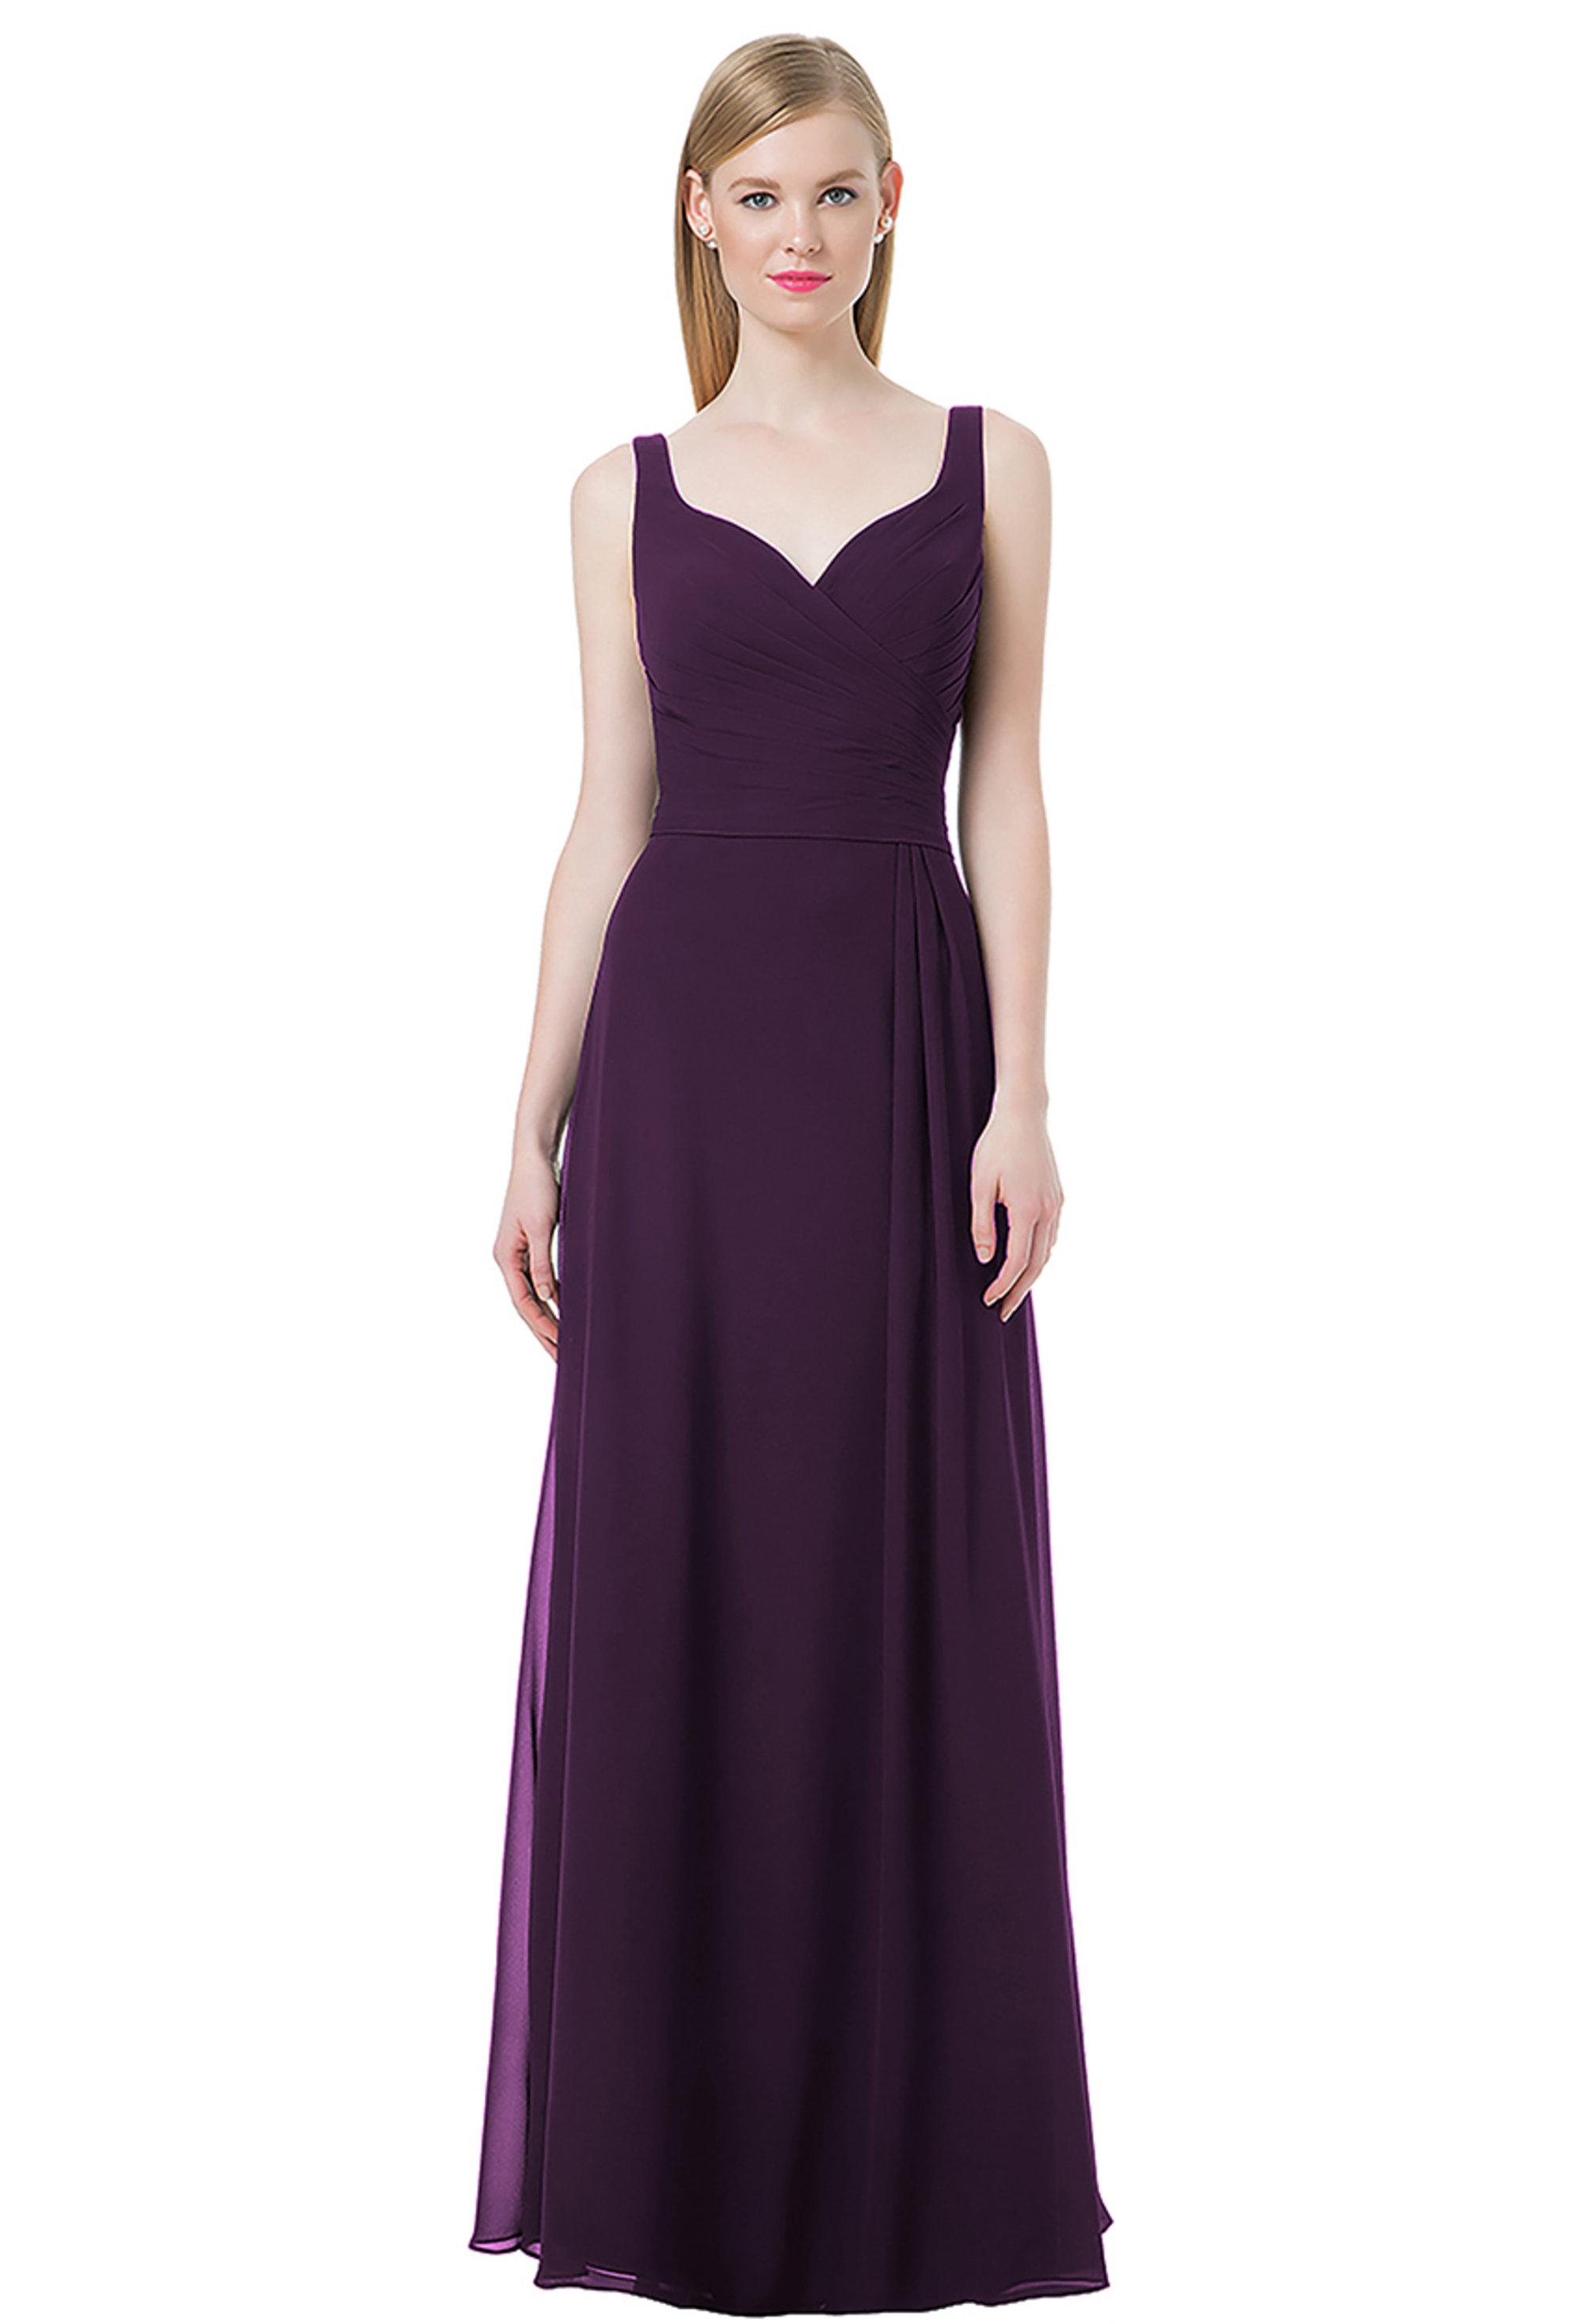 Bill Levkoff PLUM Chiffon Sweetheart A-line gown, $220.00 Front